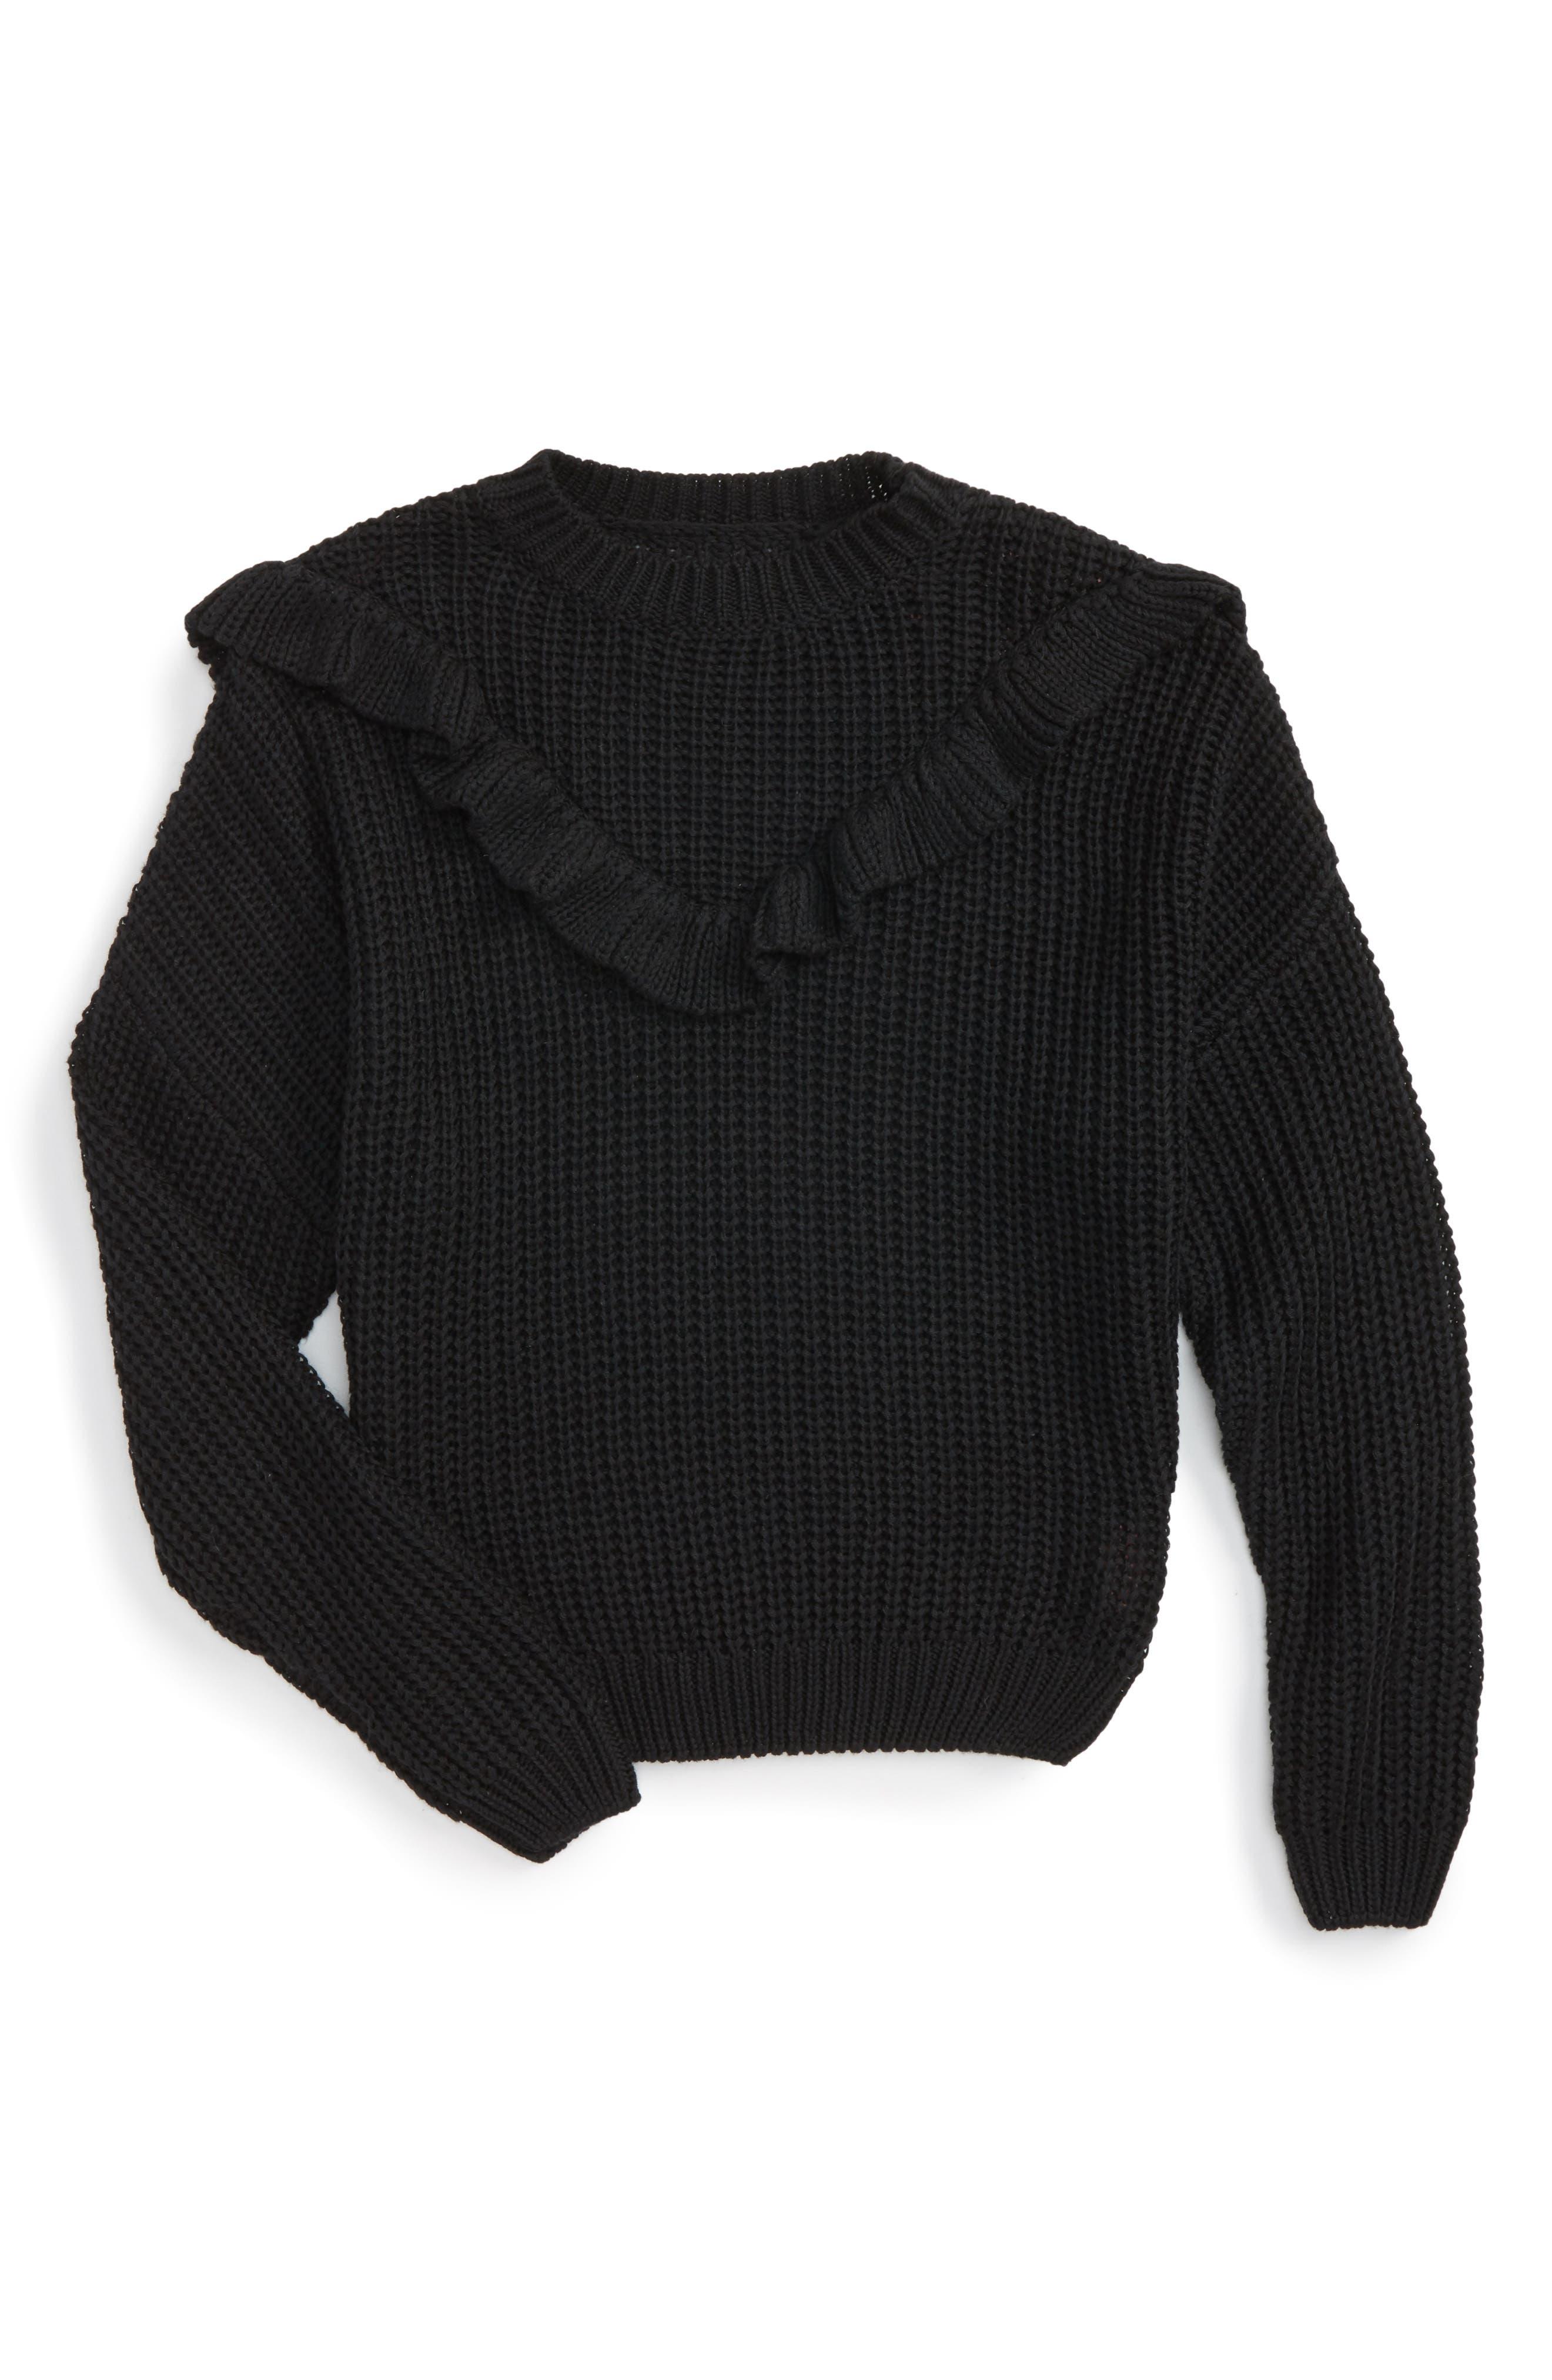 BLANCNYC Ruffle Sweater,                         Main,                         color,